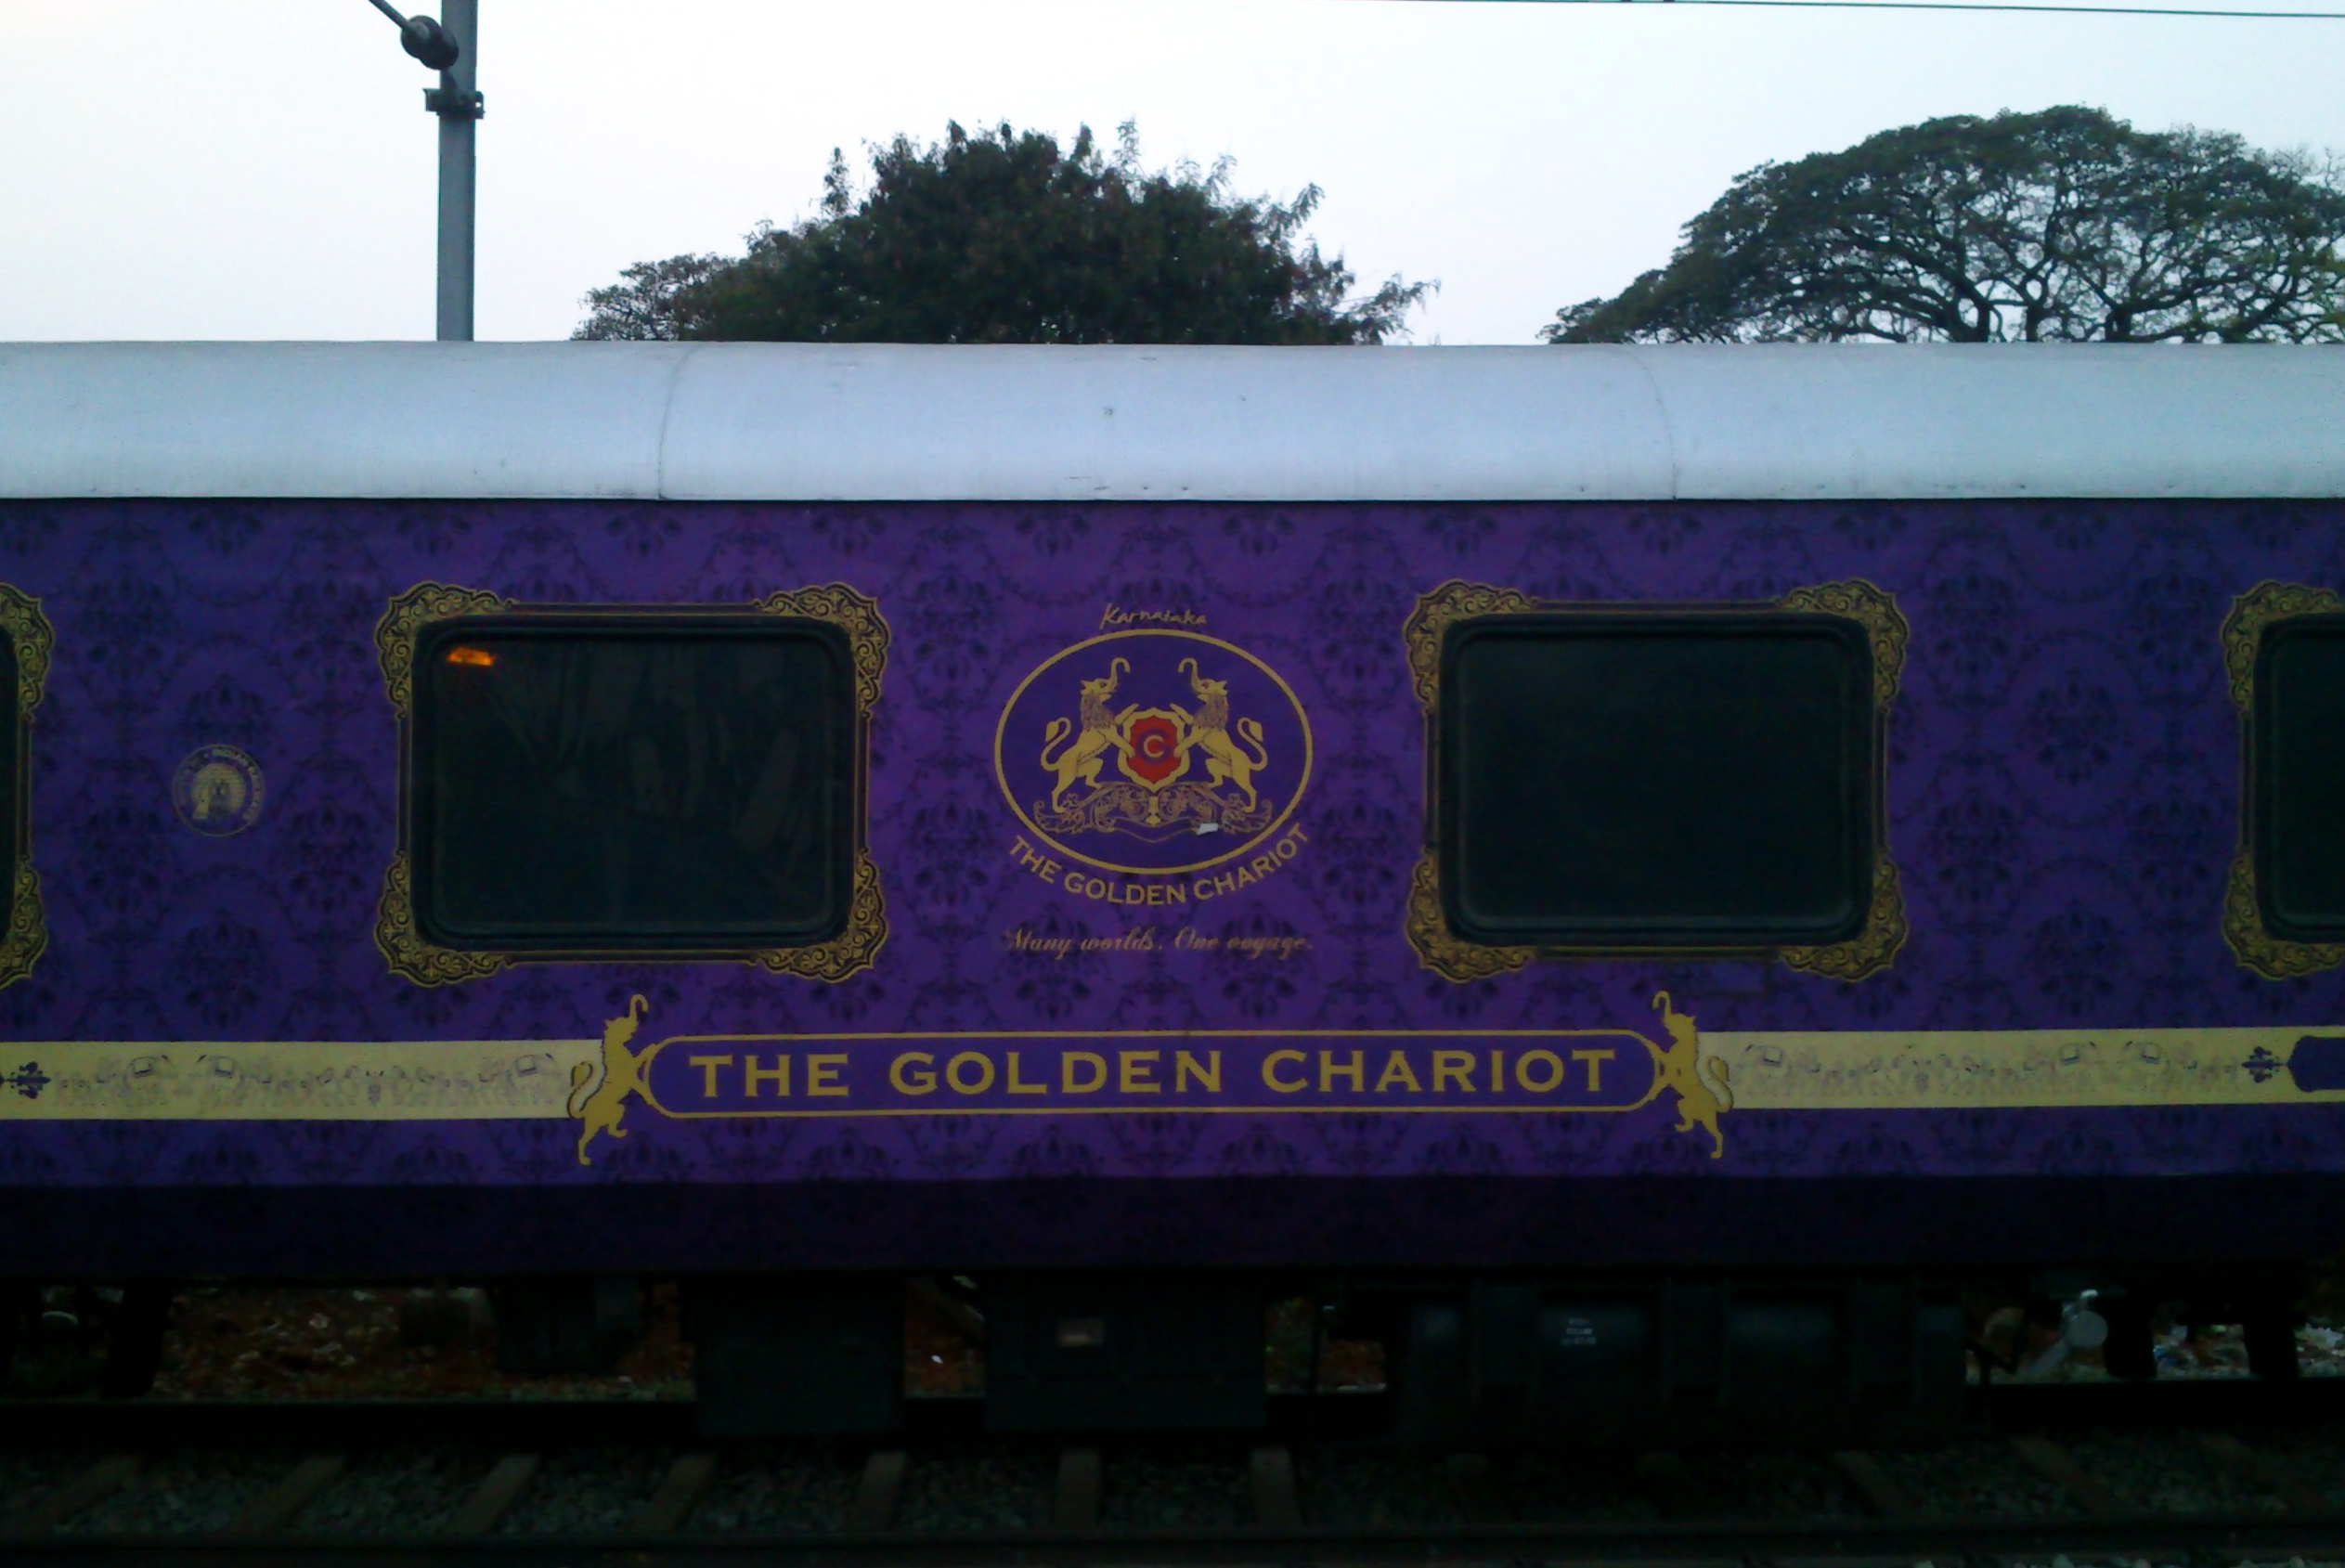 Karnataka tourism department launches Dasara package on Golden Chariot